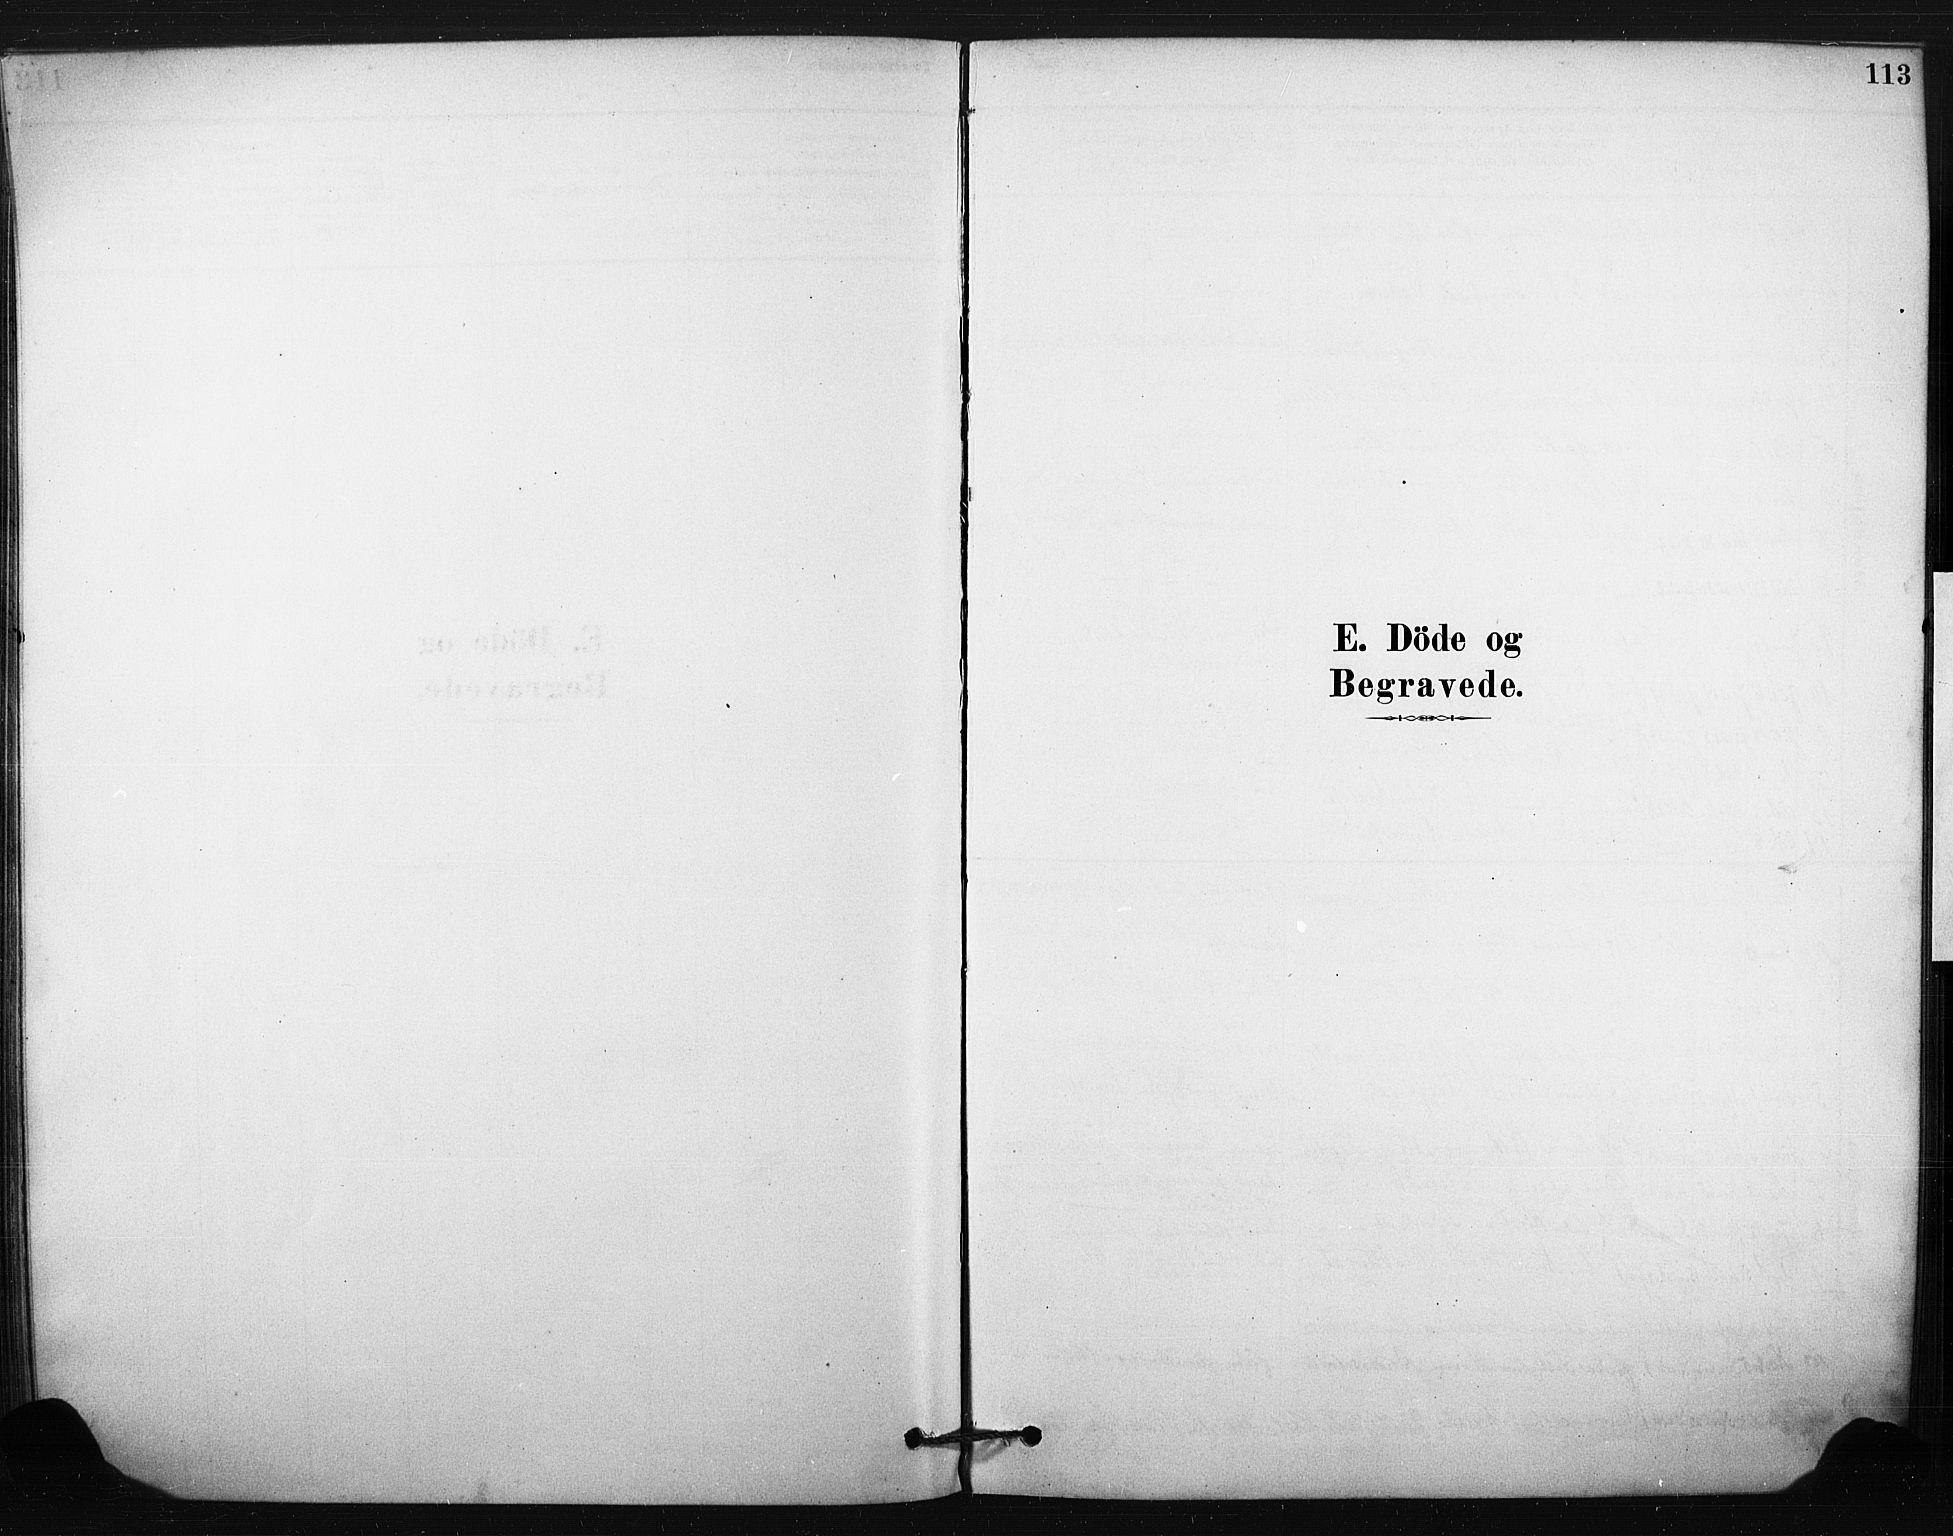 SAKO, Eiker kirkebøker, F/Fc/L0001: Ministerialbok nr. III 1, 1878-1889, s. 113